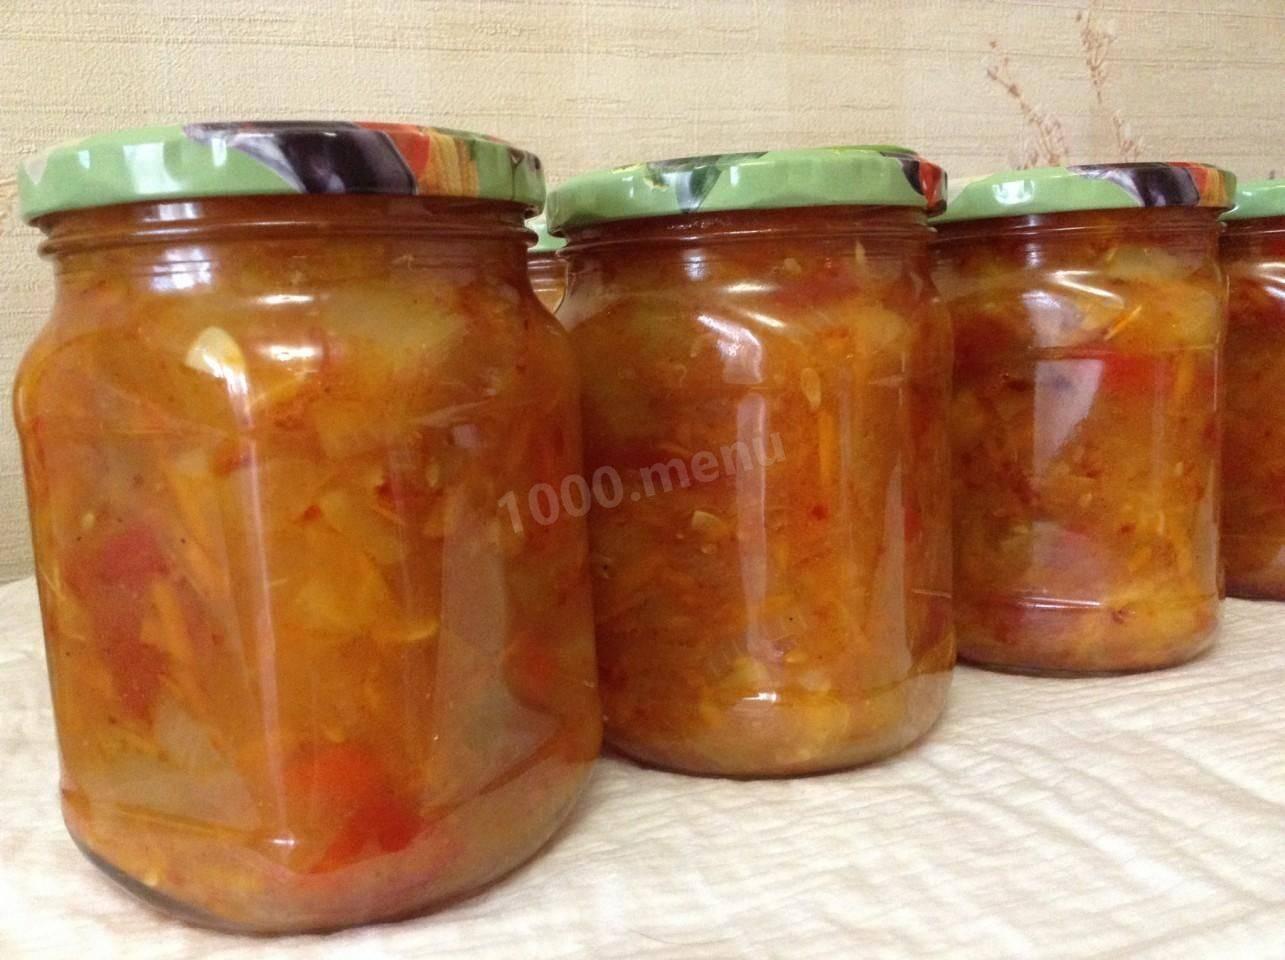 Анкл бенс из кабачков на зиму: пошаговые рецепты с фото